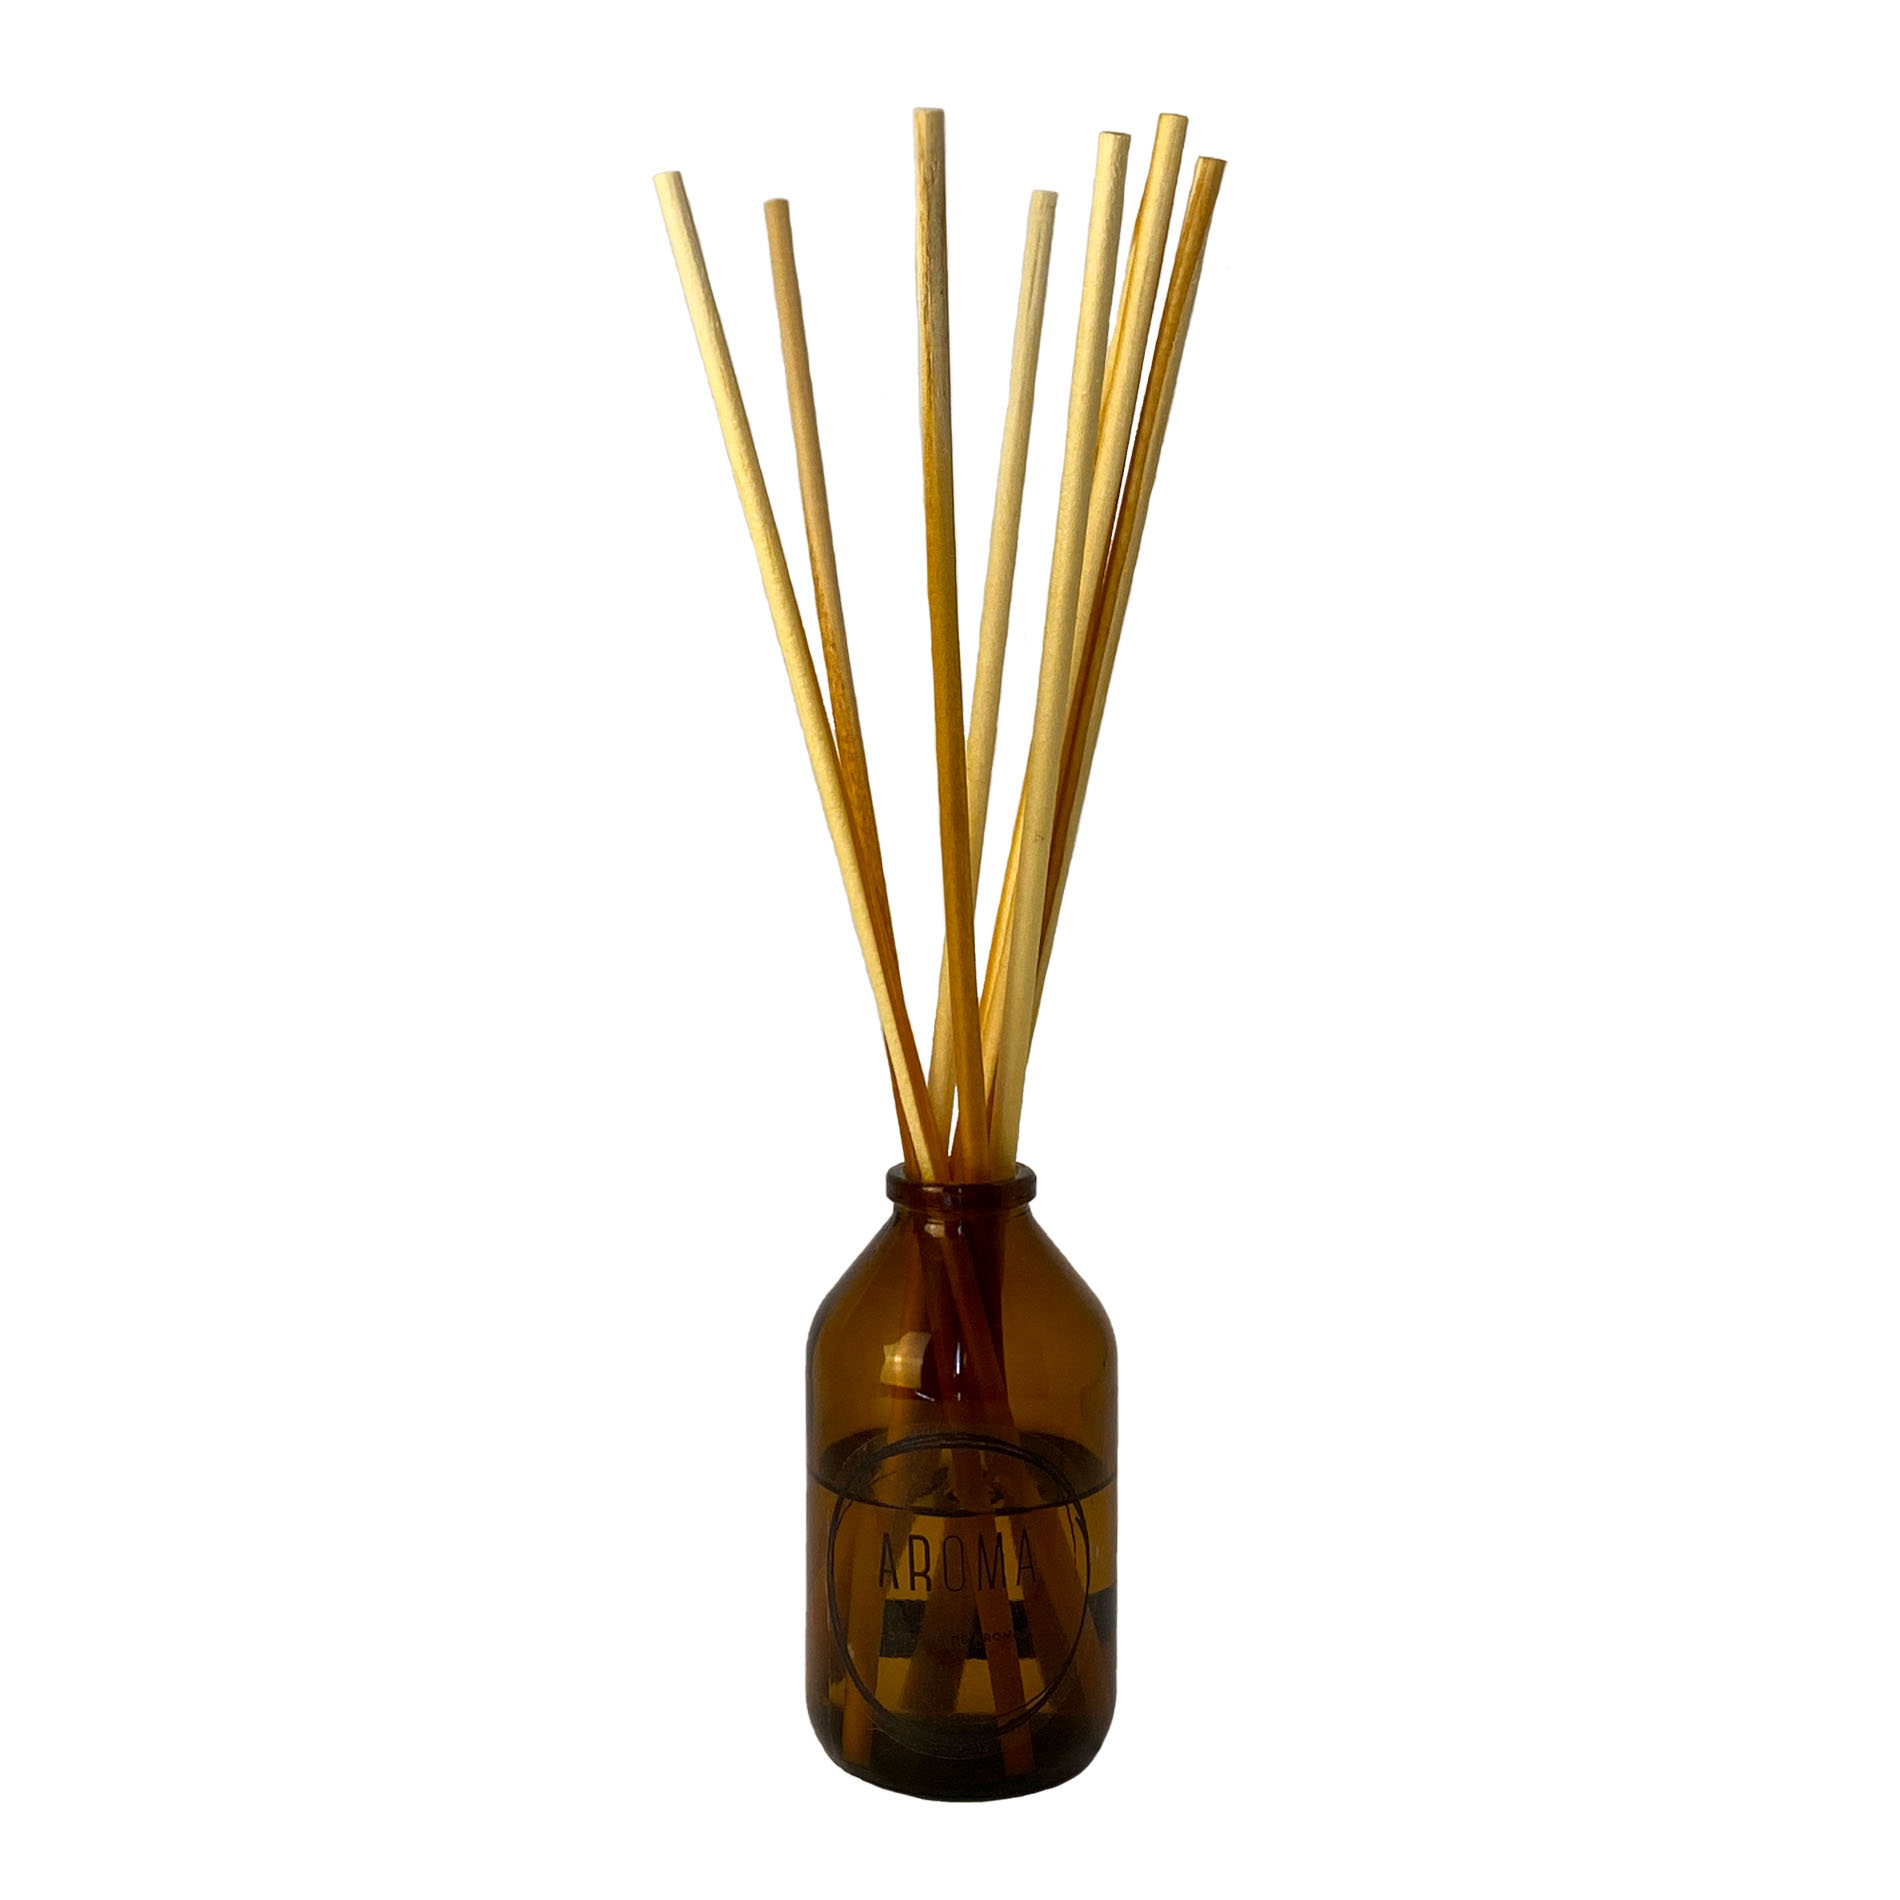 Difusor - Aroma Home Therapy - Cerejeira  - Vinerize